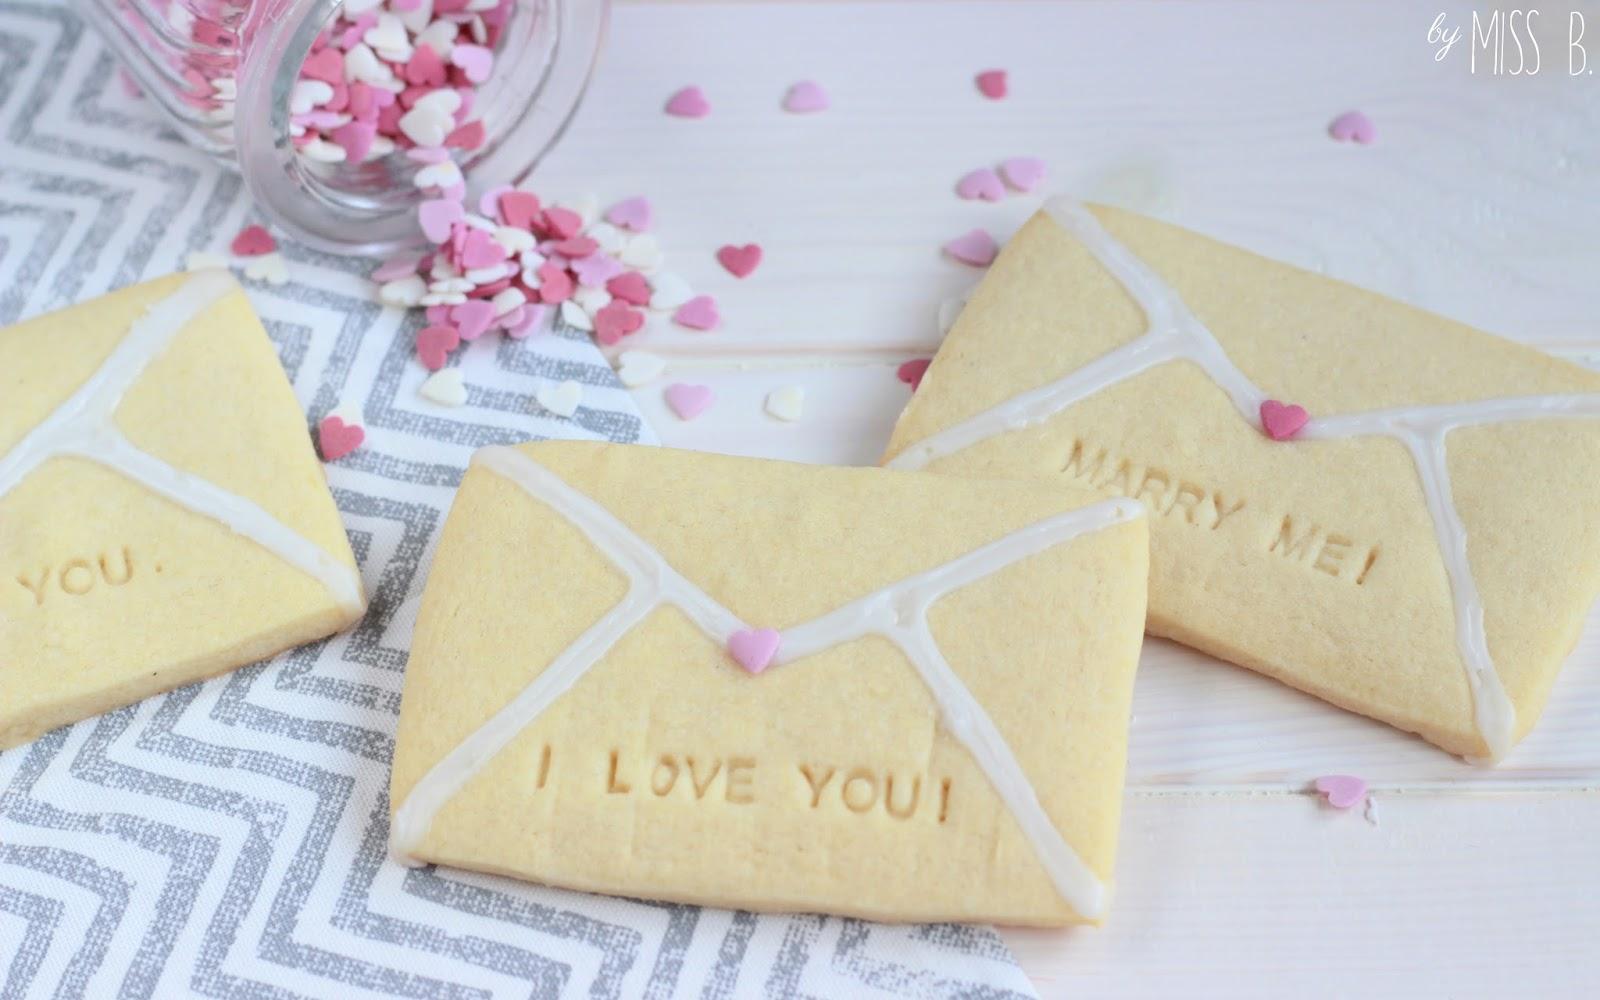 Valentinstag: Süße Liebesbrief-Kekse